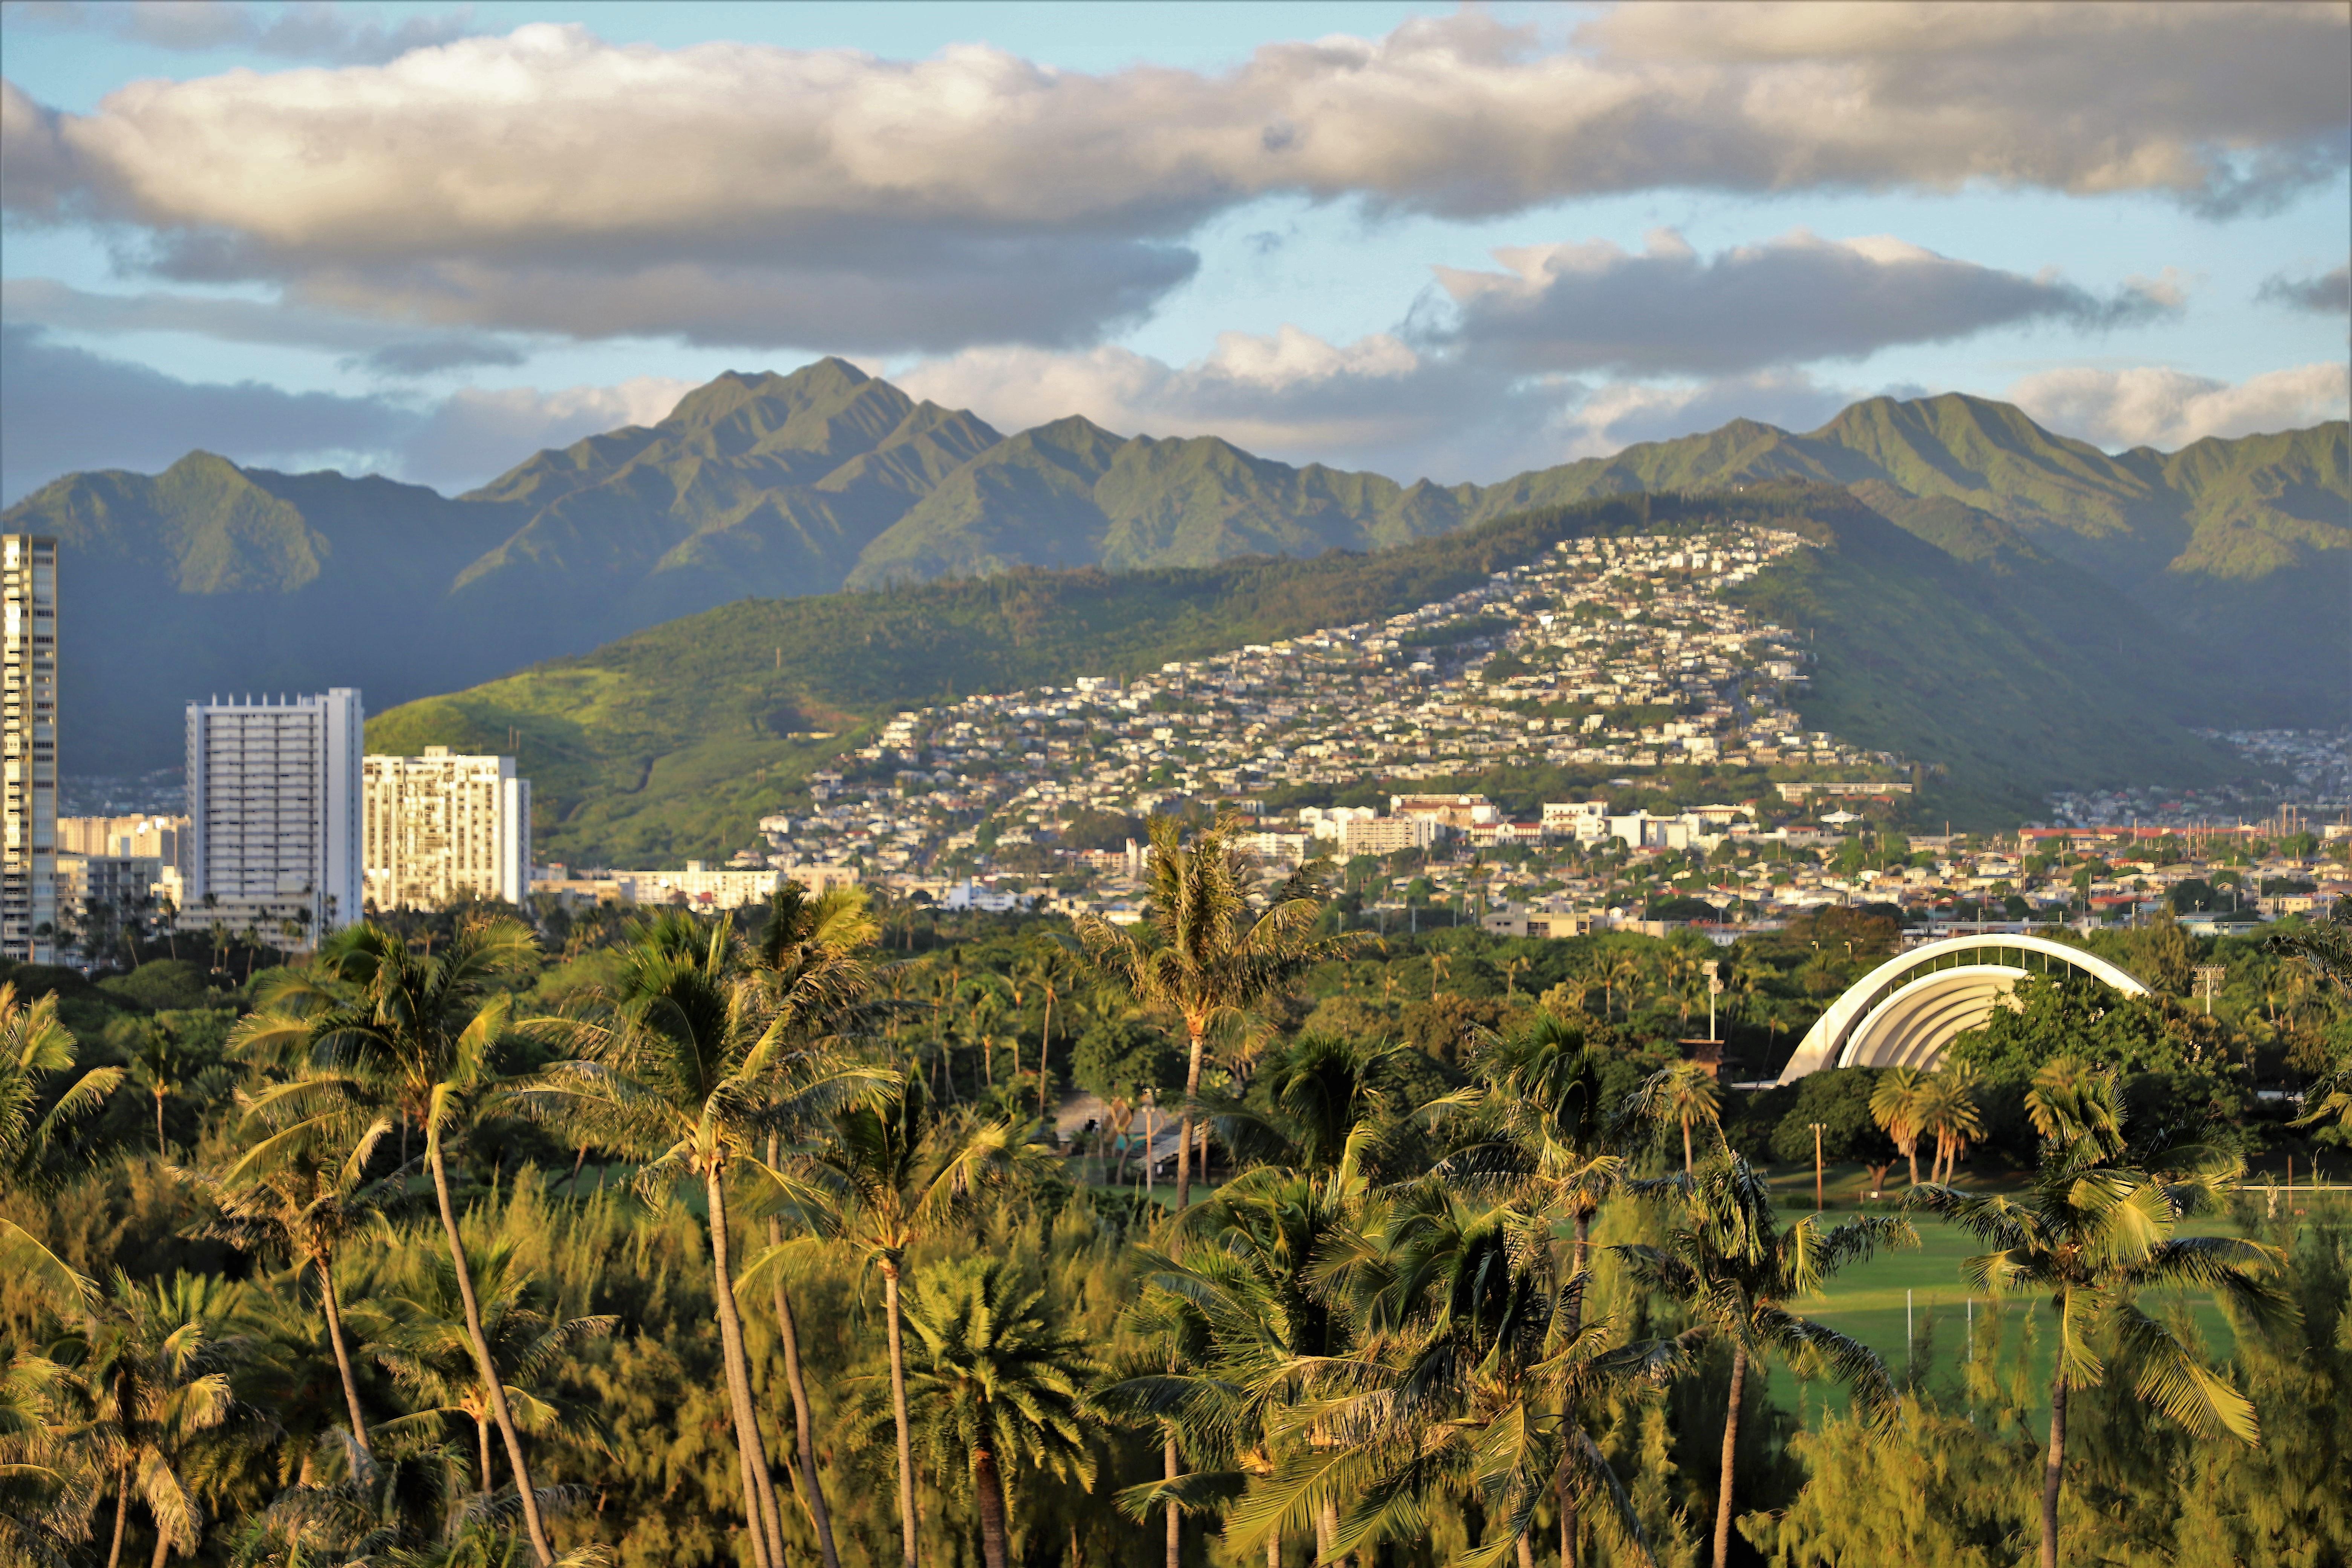 2018 11 10 78 Honolulu.JPG